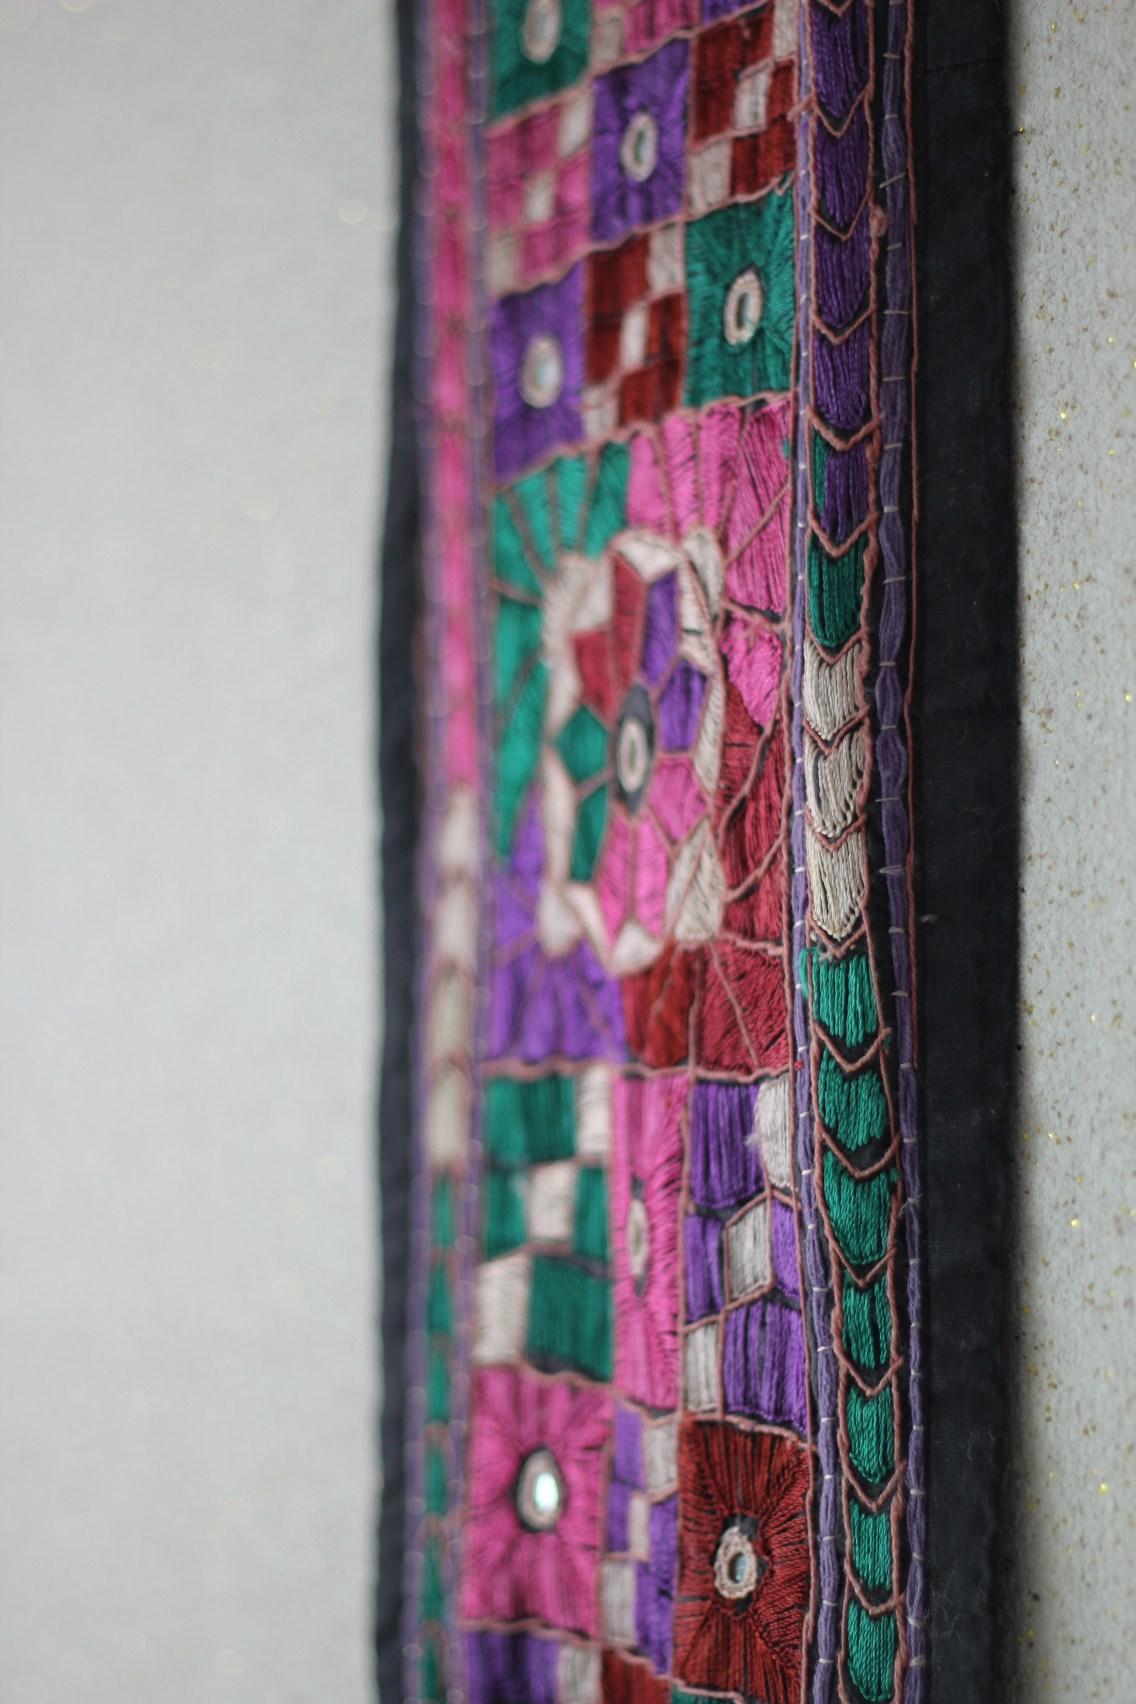 Decorative fabric D gave me. Its colors make me happy.